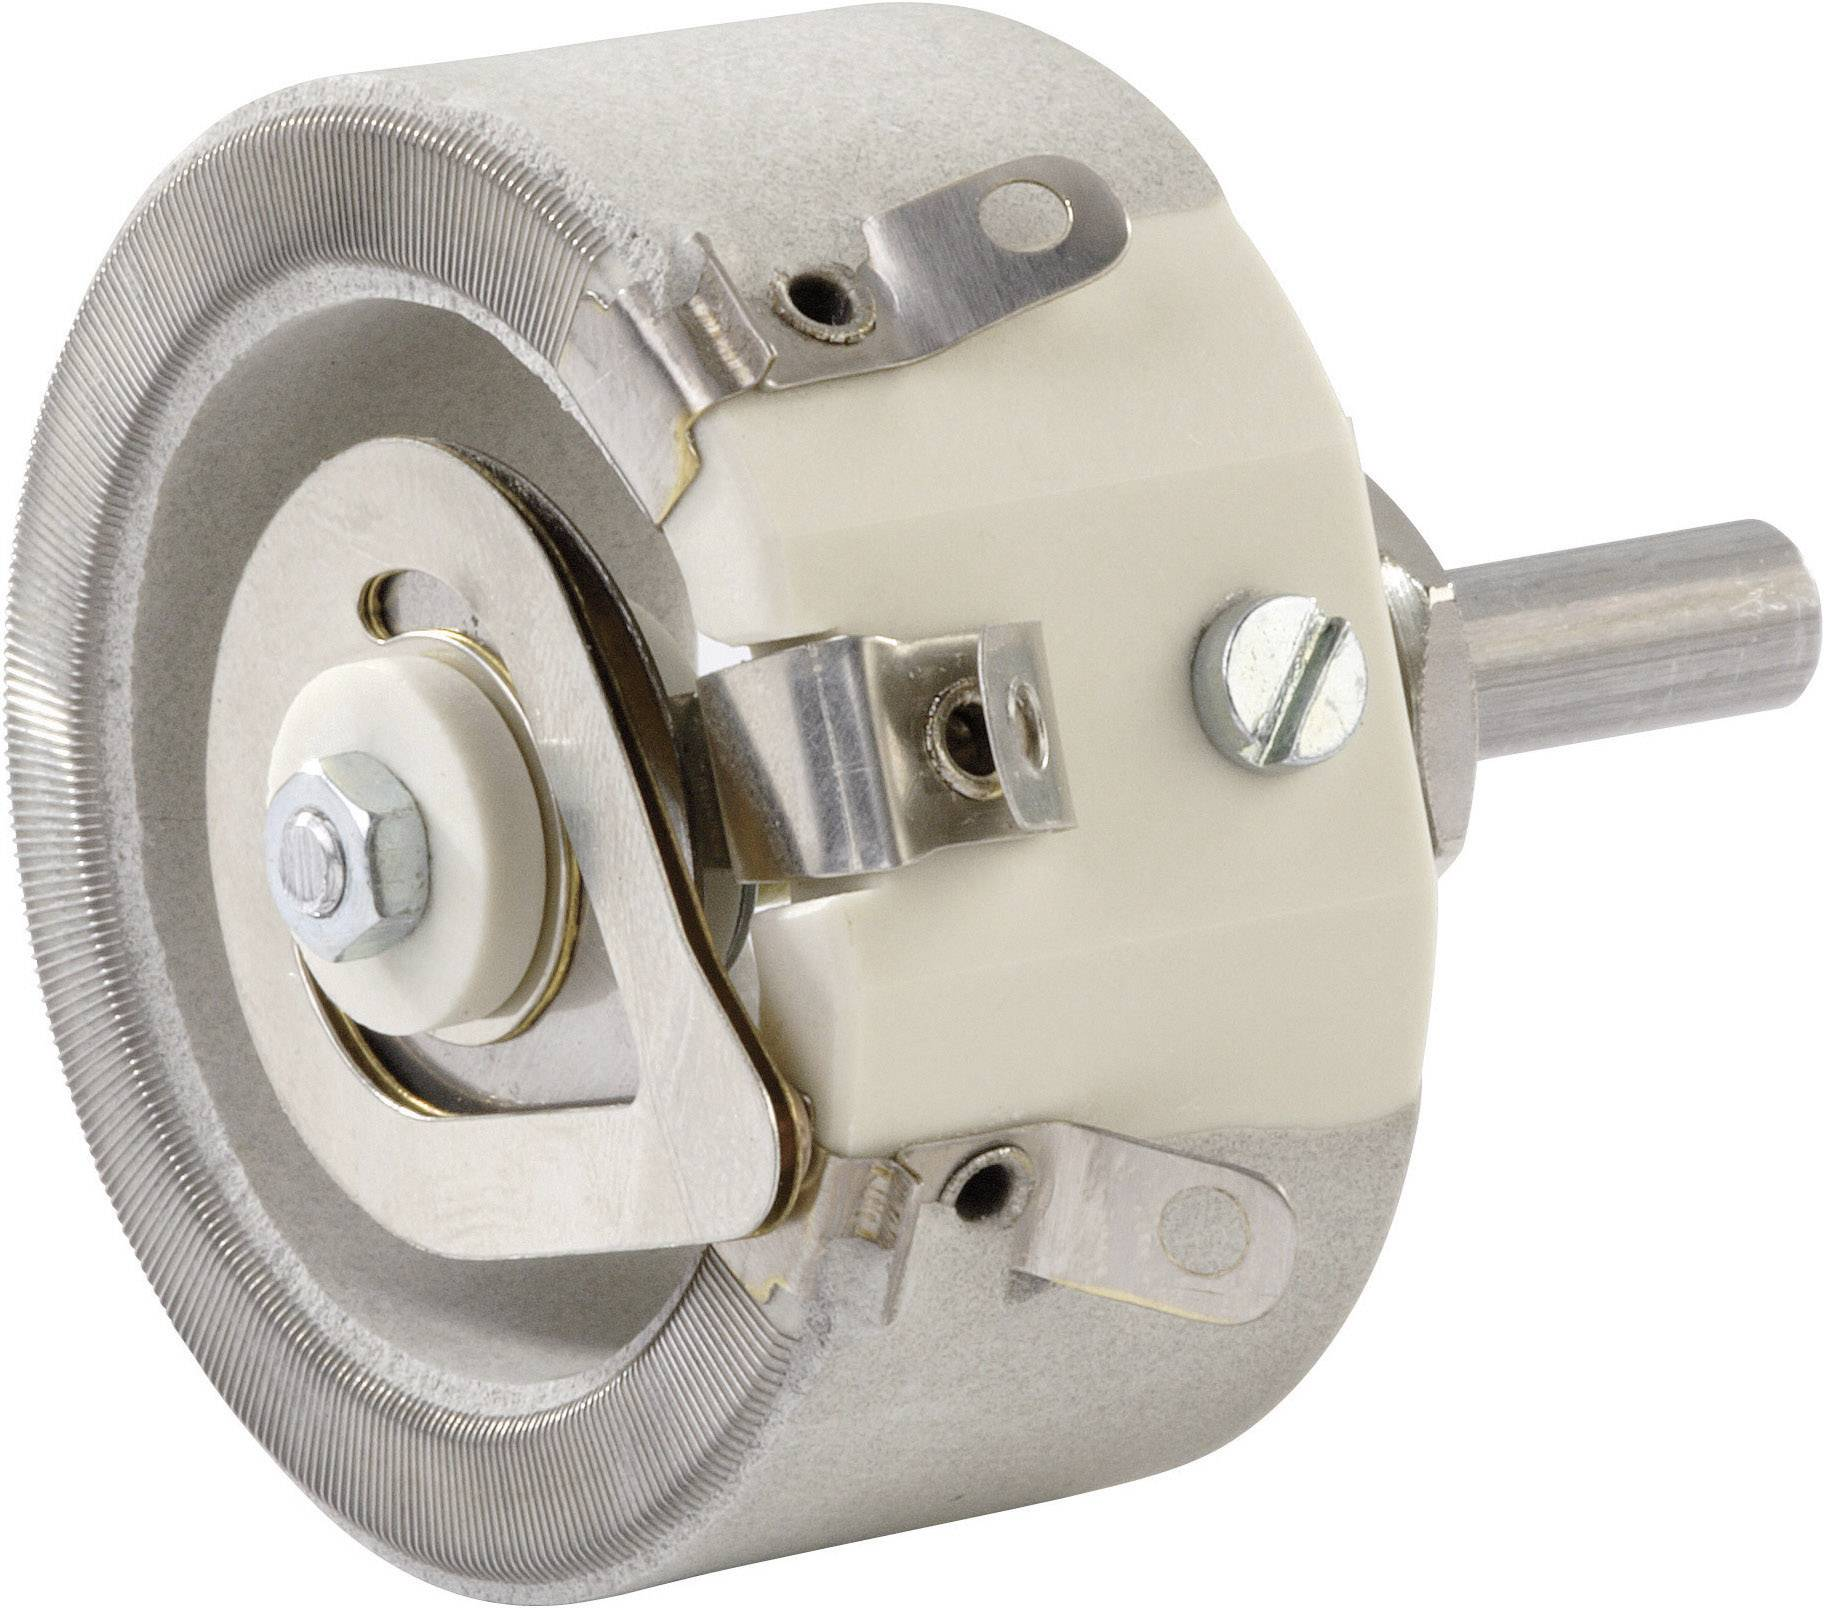 Drátový výkonový potenciometr TT Electronic, 4,7 kΩ ± 10%, 10 W, LIN